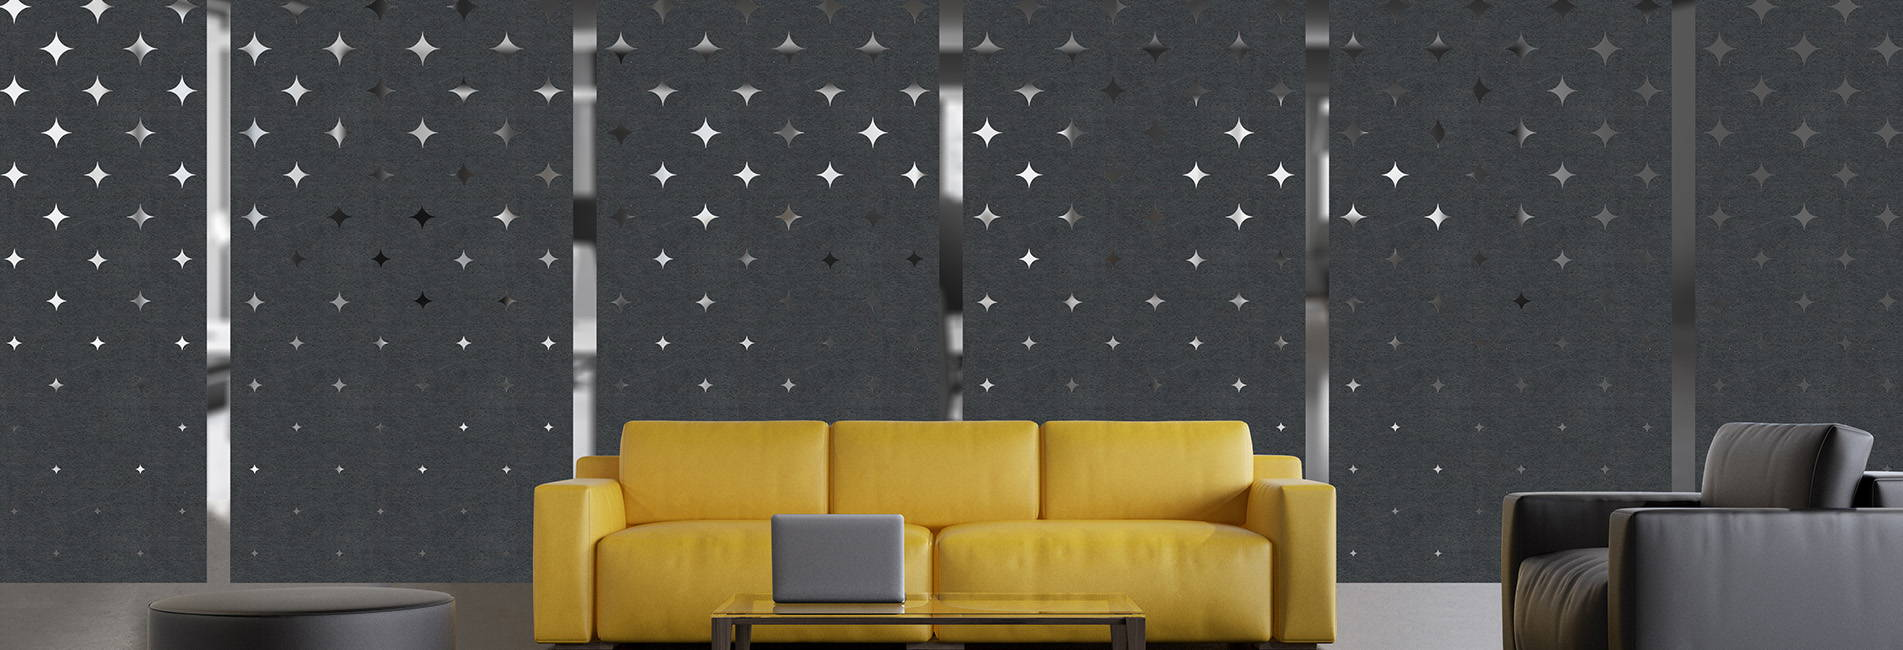 Starry panels hero image